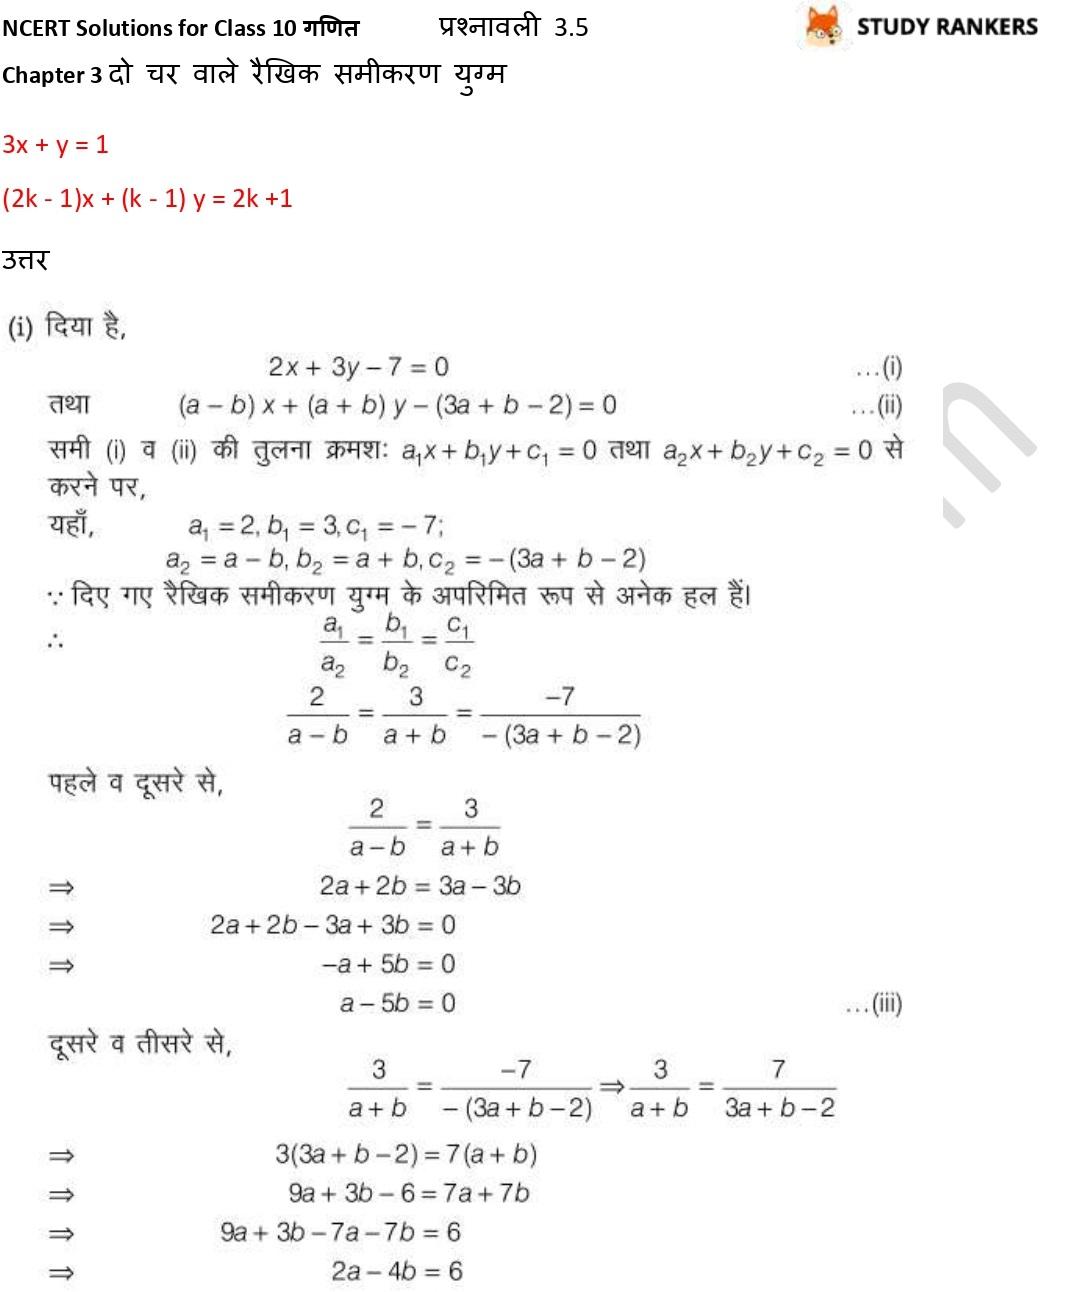 NCERT Solutions for Class 10 Maths Chapter 3 दो चर वाले रैखिक समीकरण युग्म प्रश्नावली 3.5 Part 4